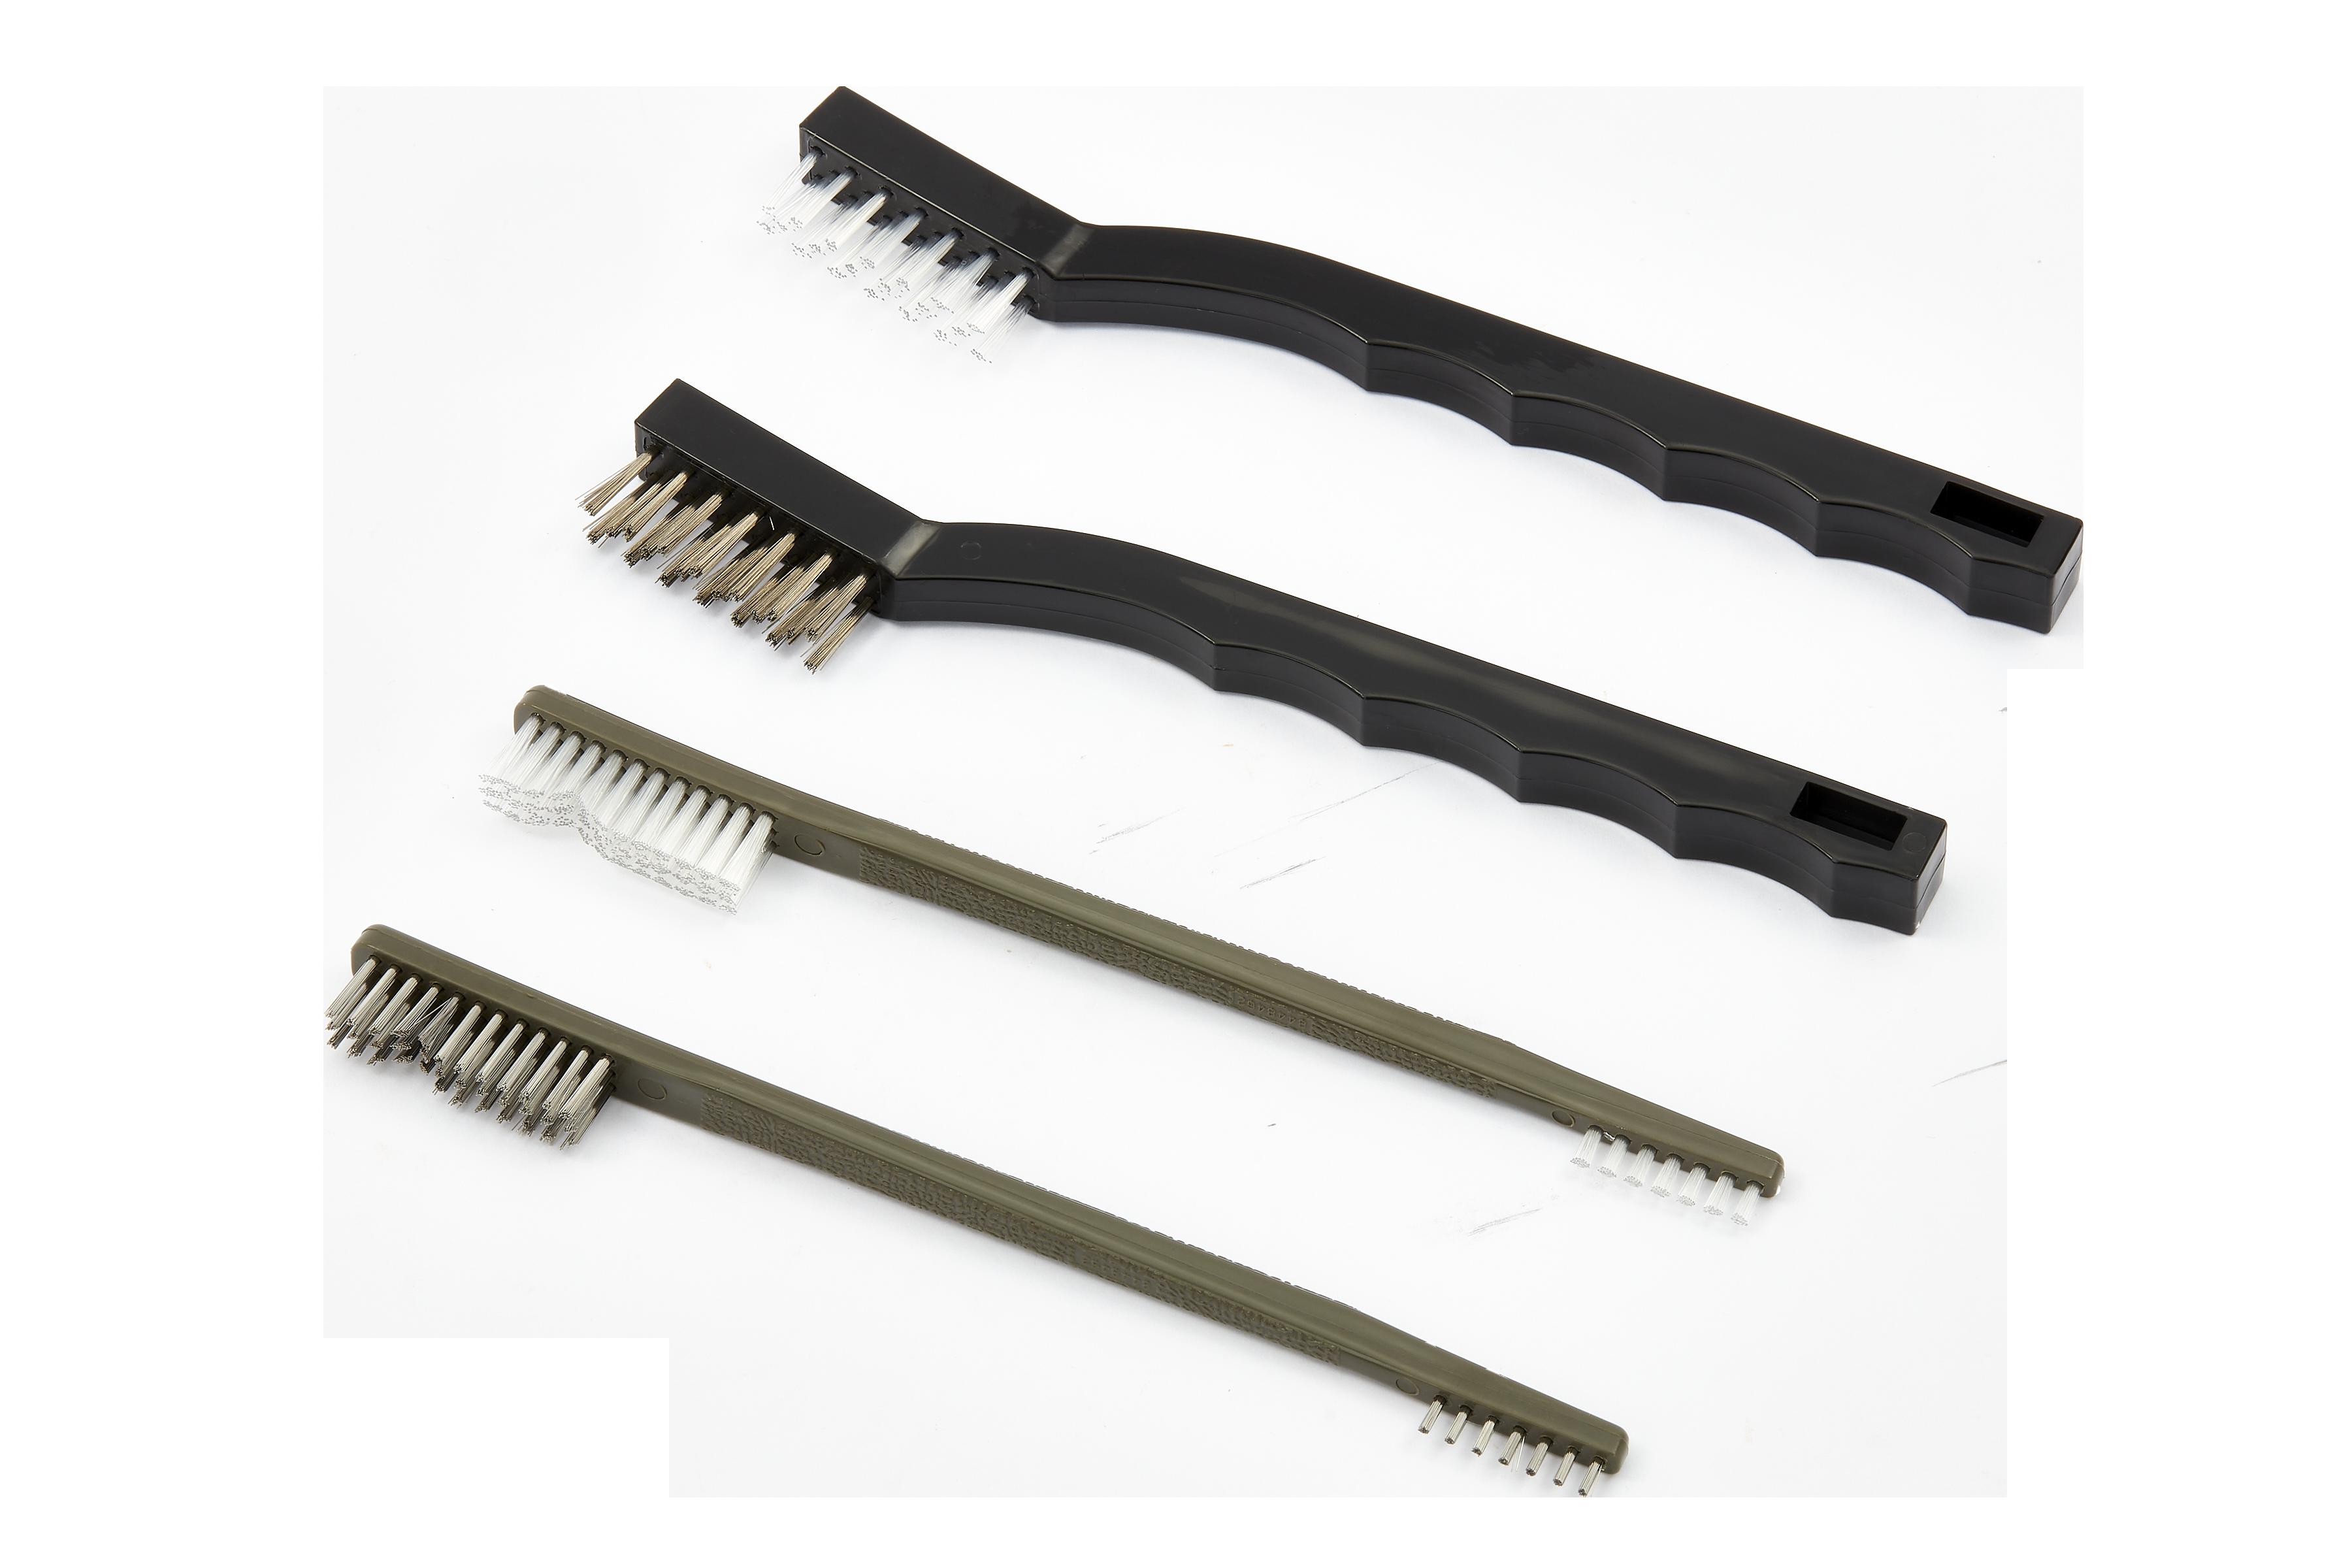 Instrument Care & Maintenance